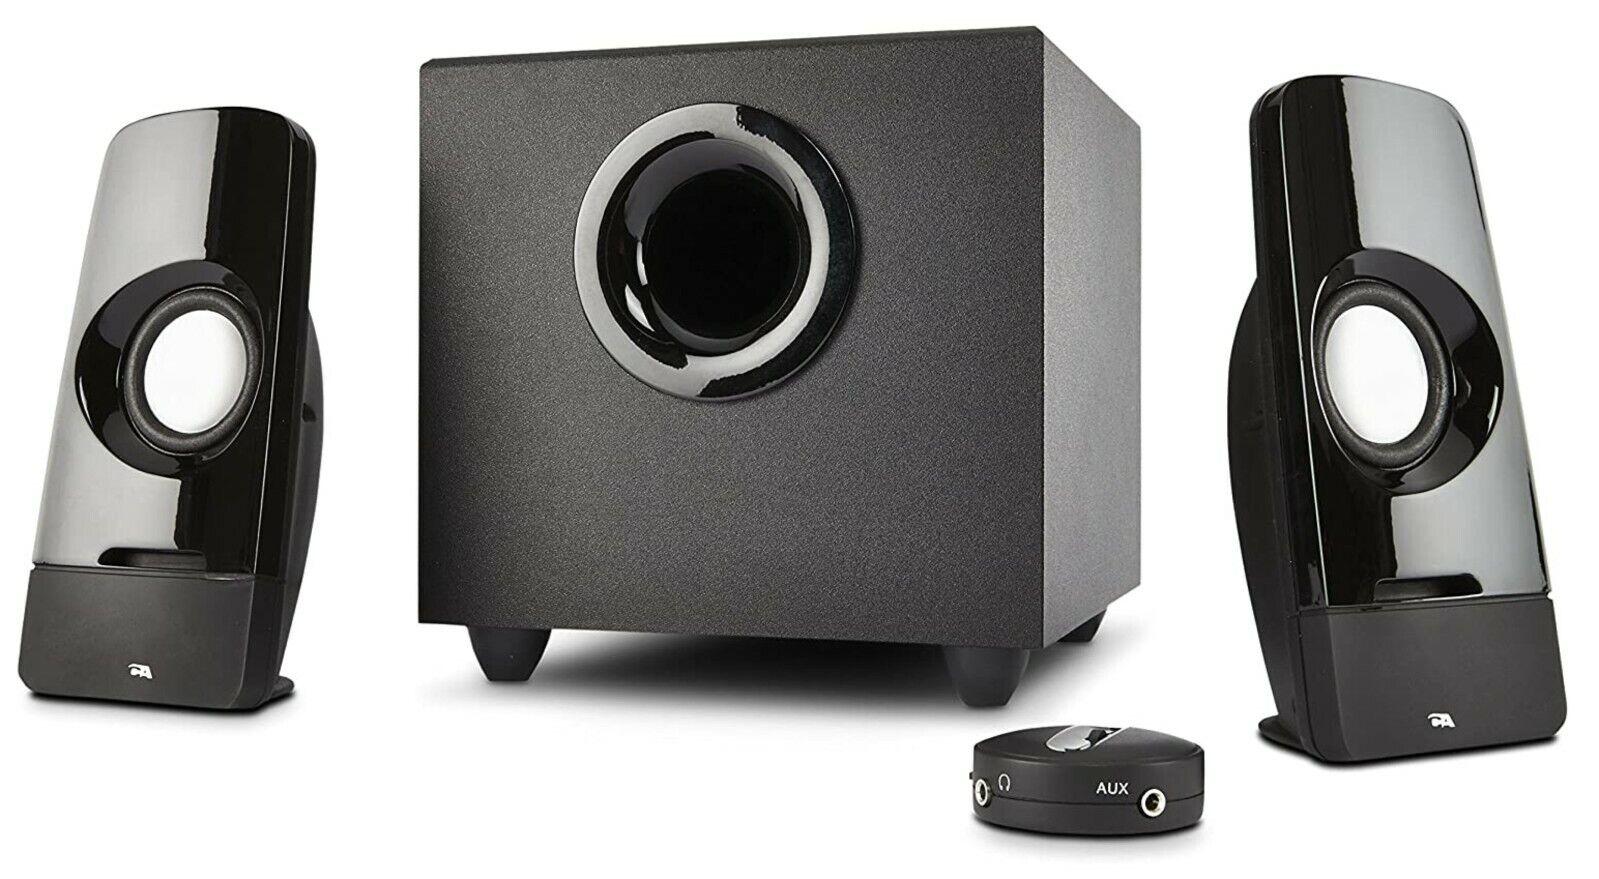 Cyber Acoustics Curve Blast 2.1 Speaker System - 8 W RMS - L